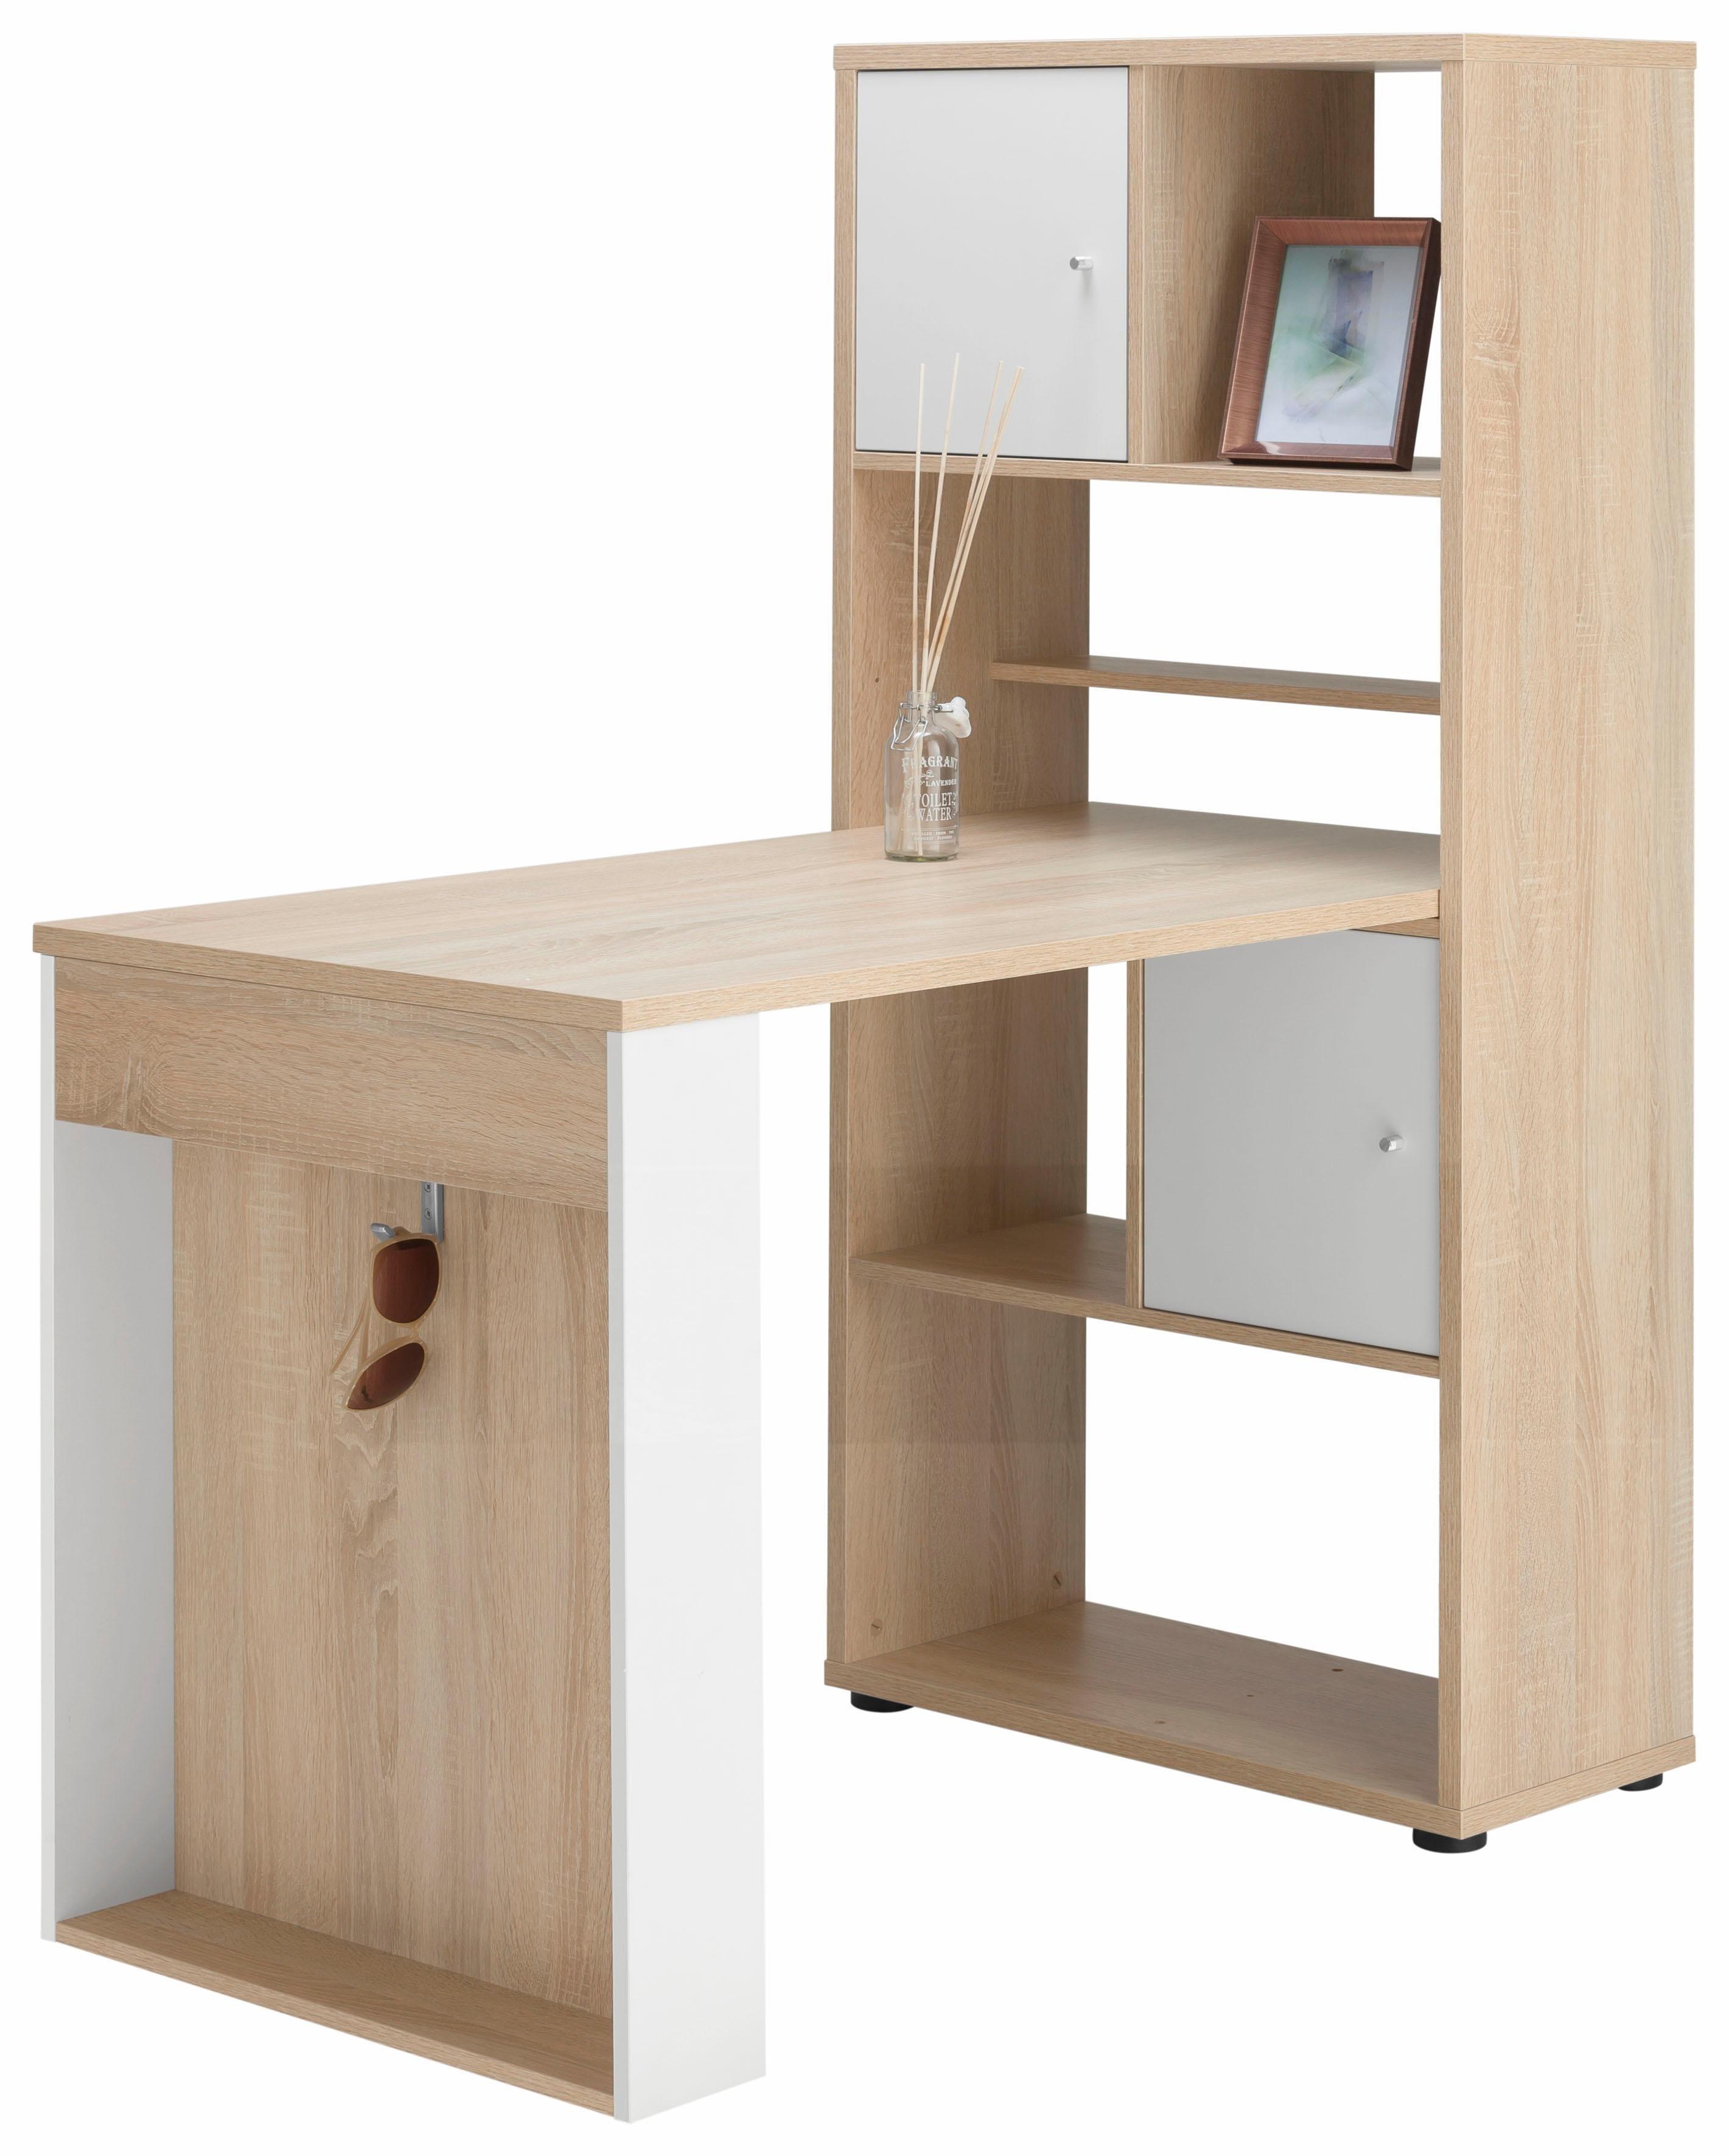 mini office maja preisvergleich. Black Bedroom Furniture Sets. Home Design Ideas